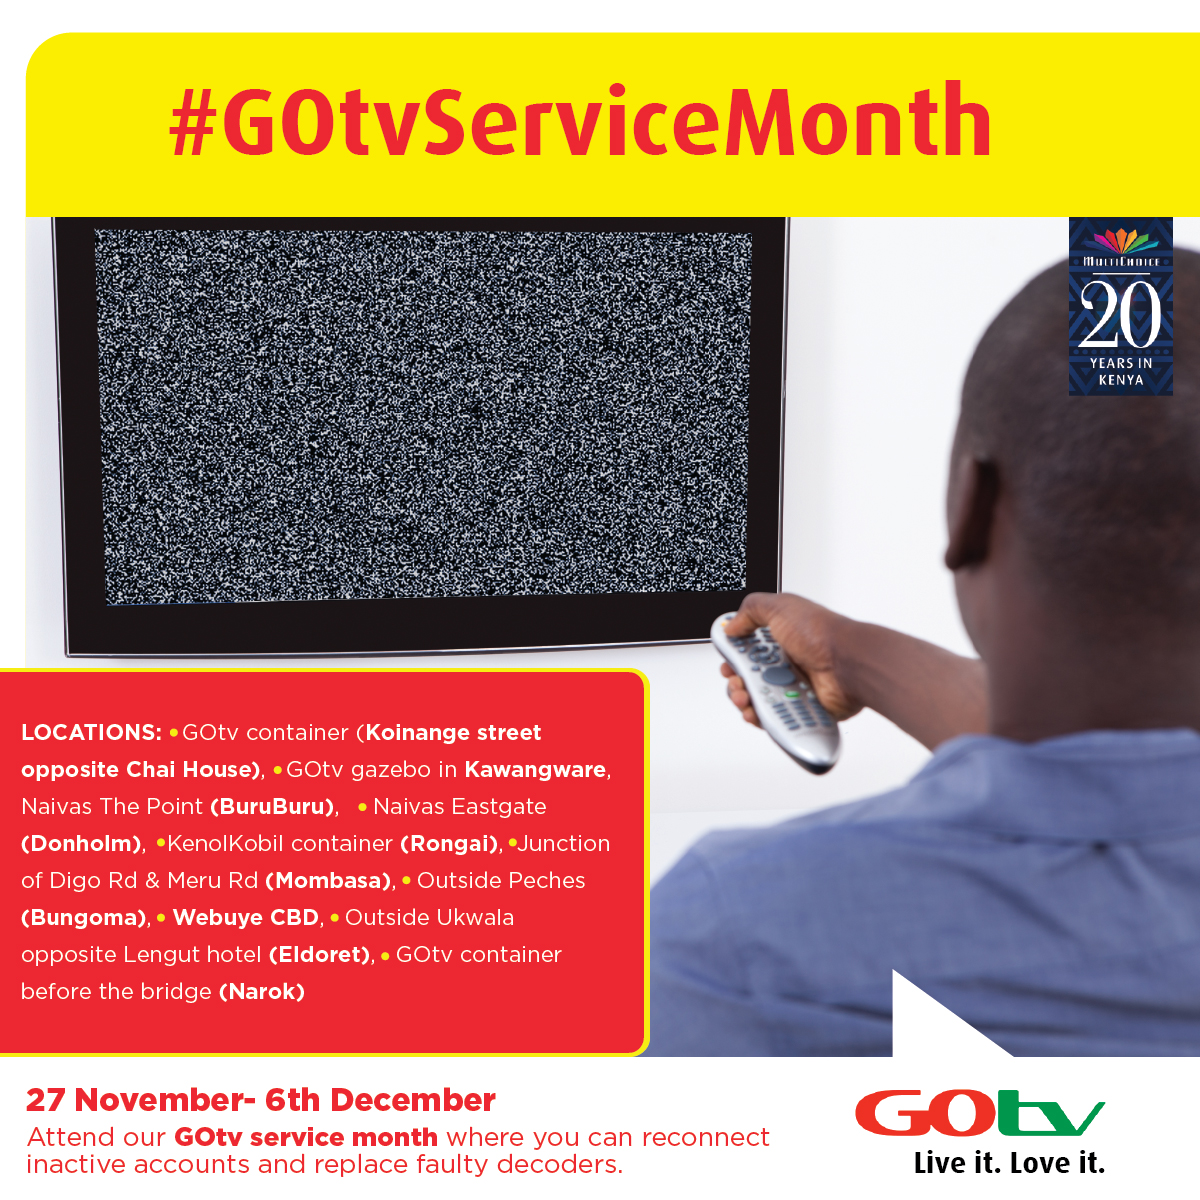 GOtv_service-month